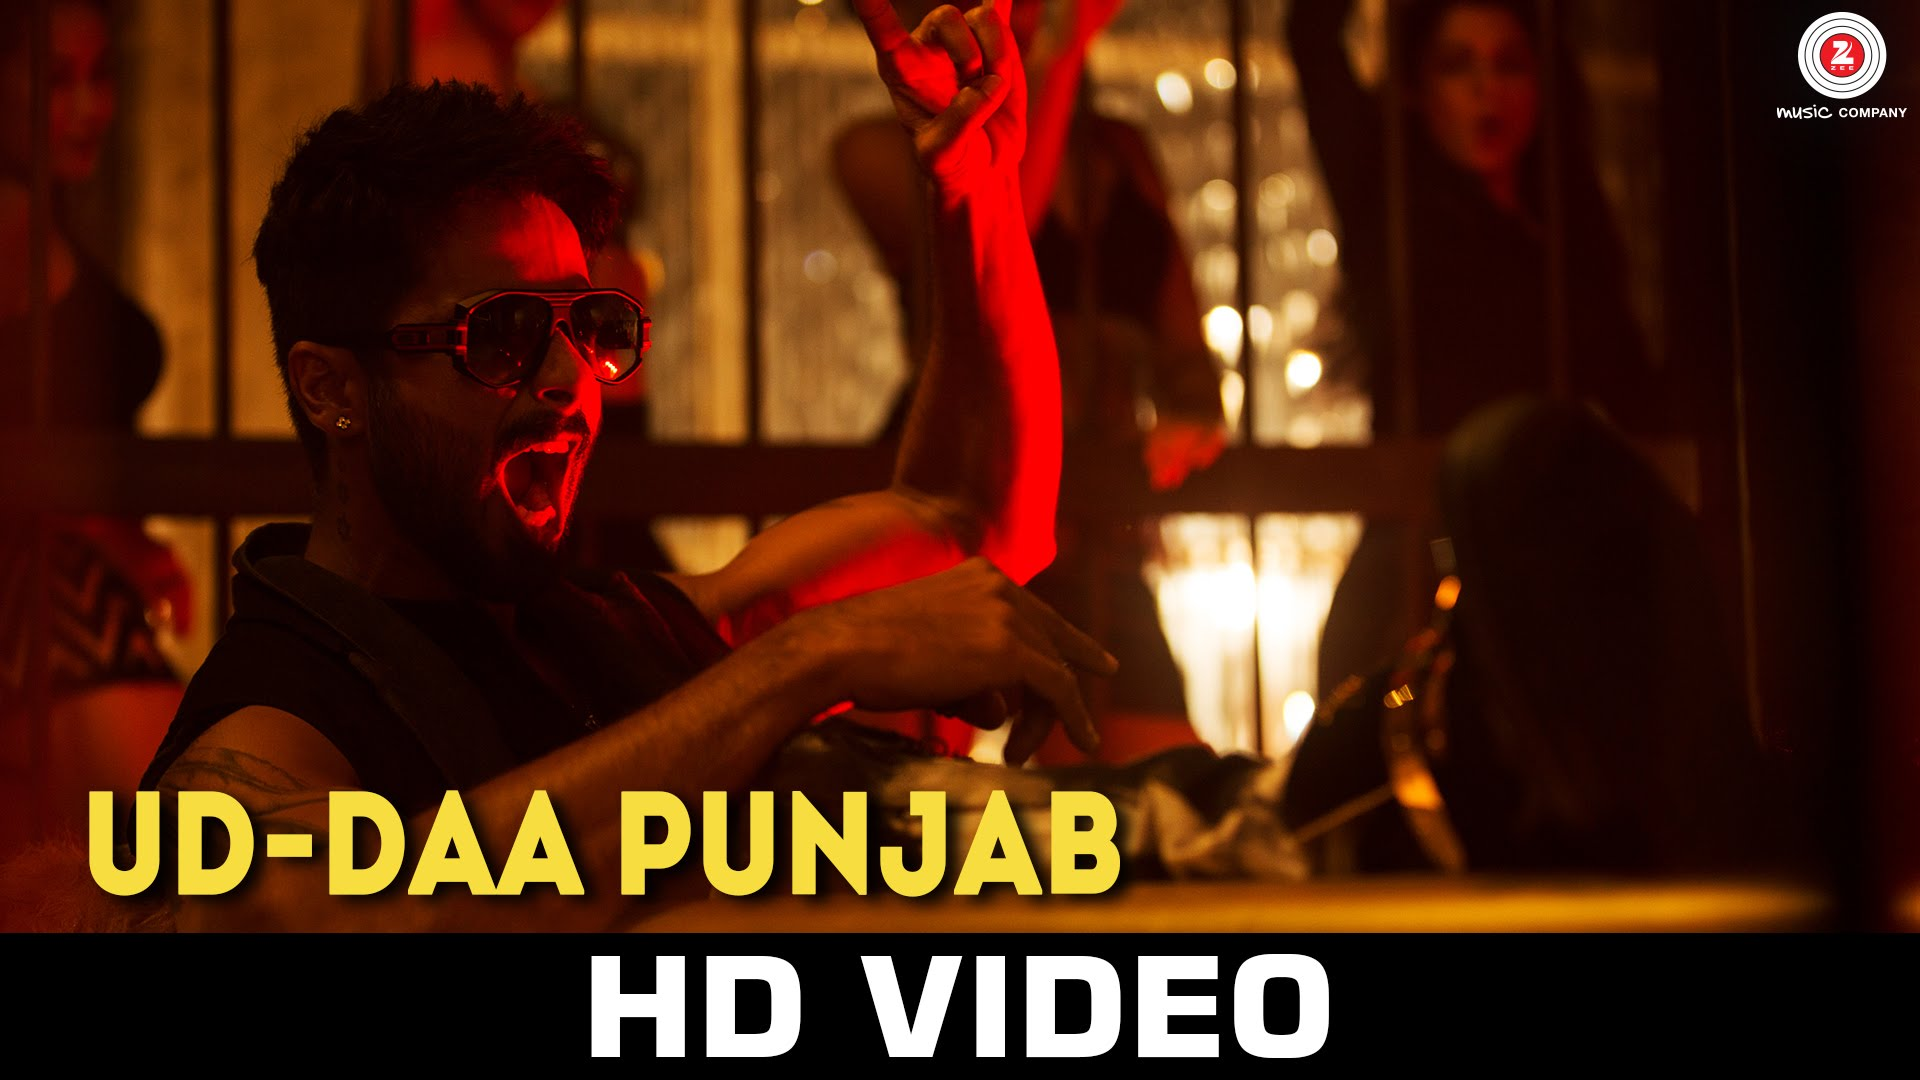 Watch Shahid Kapoor's Unbeatable Energy 'Ud-Daa Punjab' Song From Udta Punjab